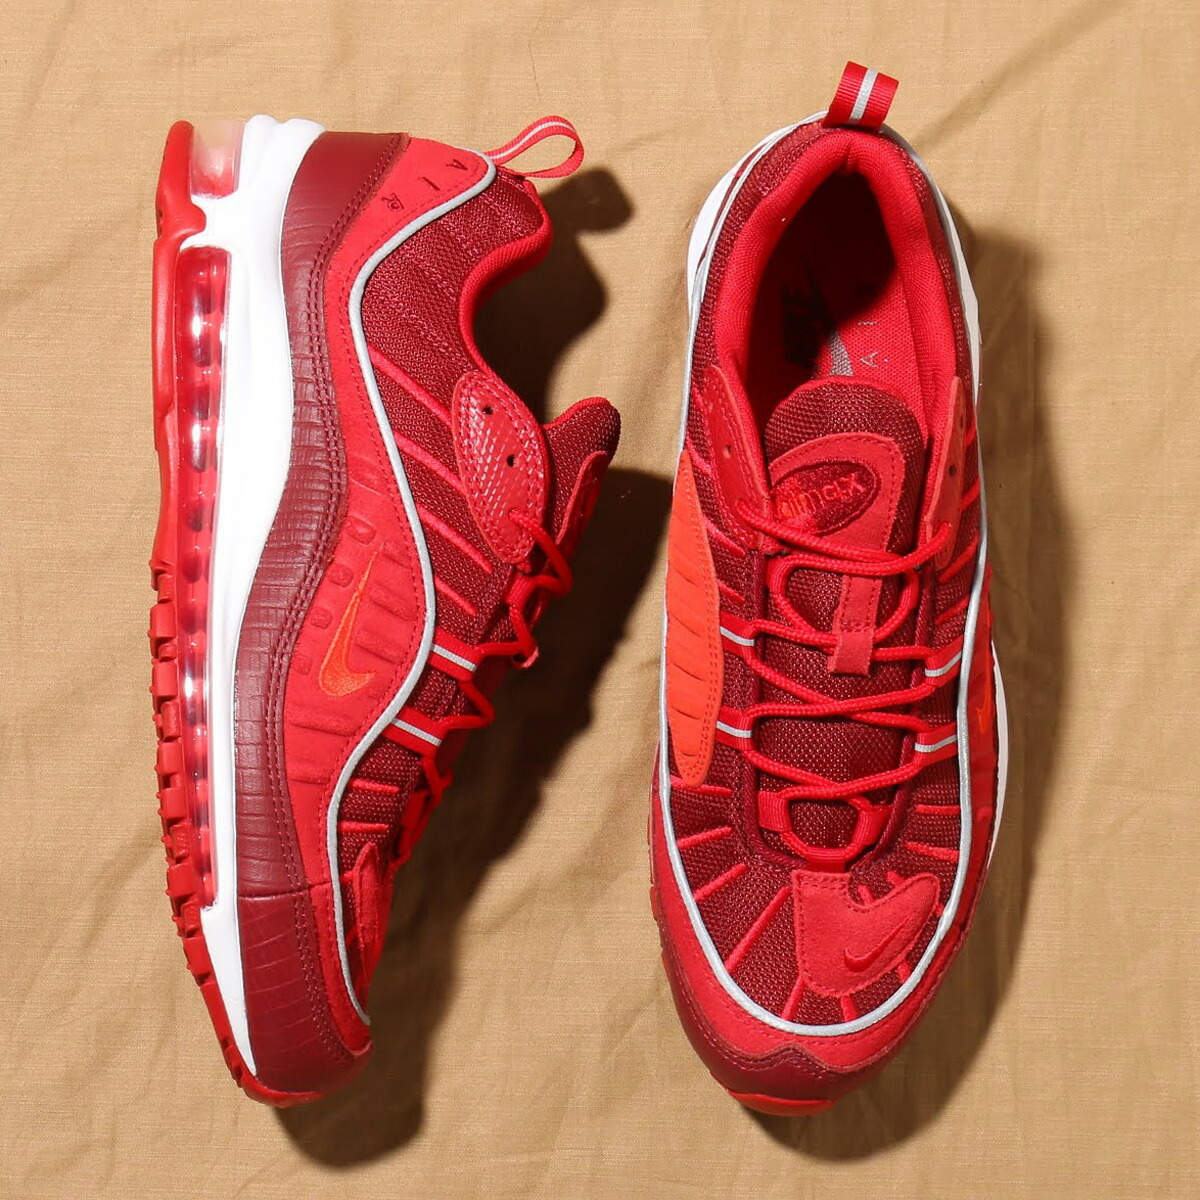 ebf309104a170 NIKE AIR MAX 98 SE (ナイキ エア マックス 98 SE) TEAM RED/HABANERO RED-GYM RED-WHITE  【メンズ スニーカー】